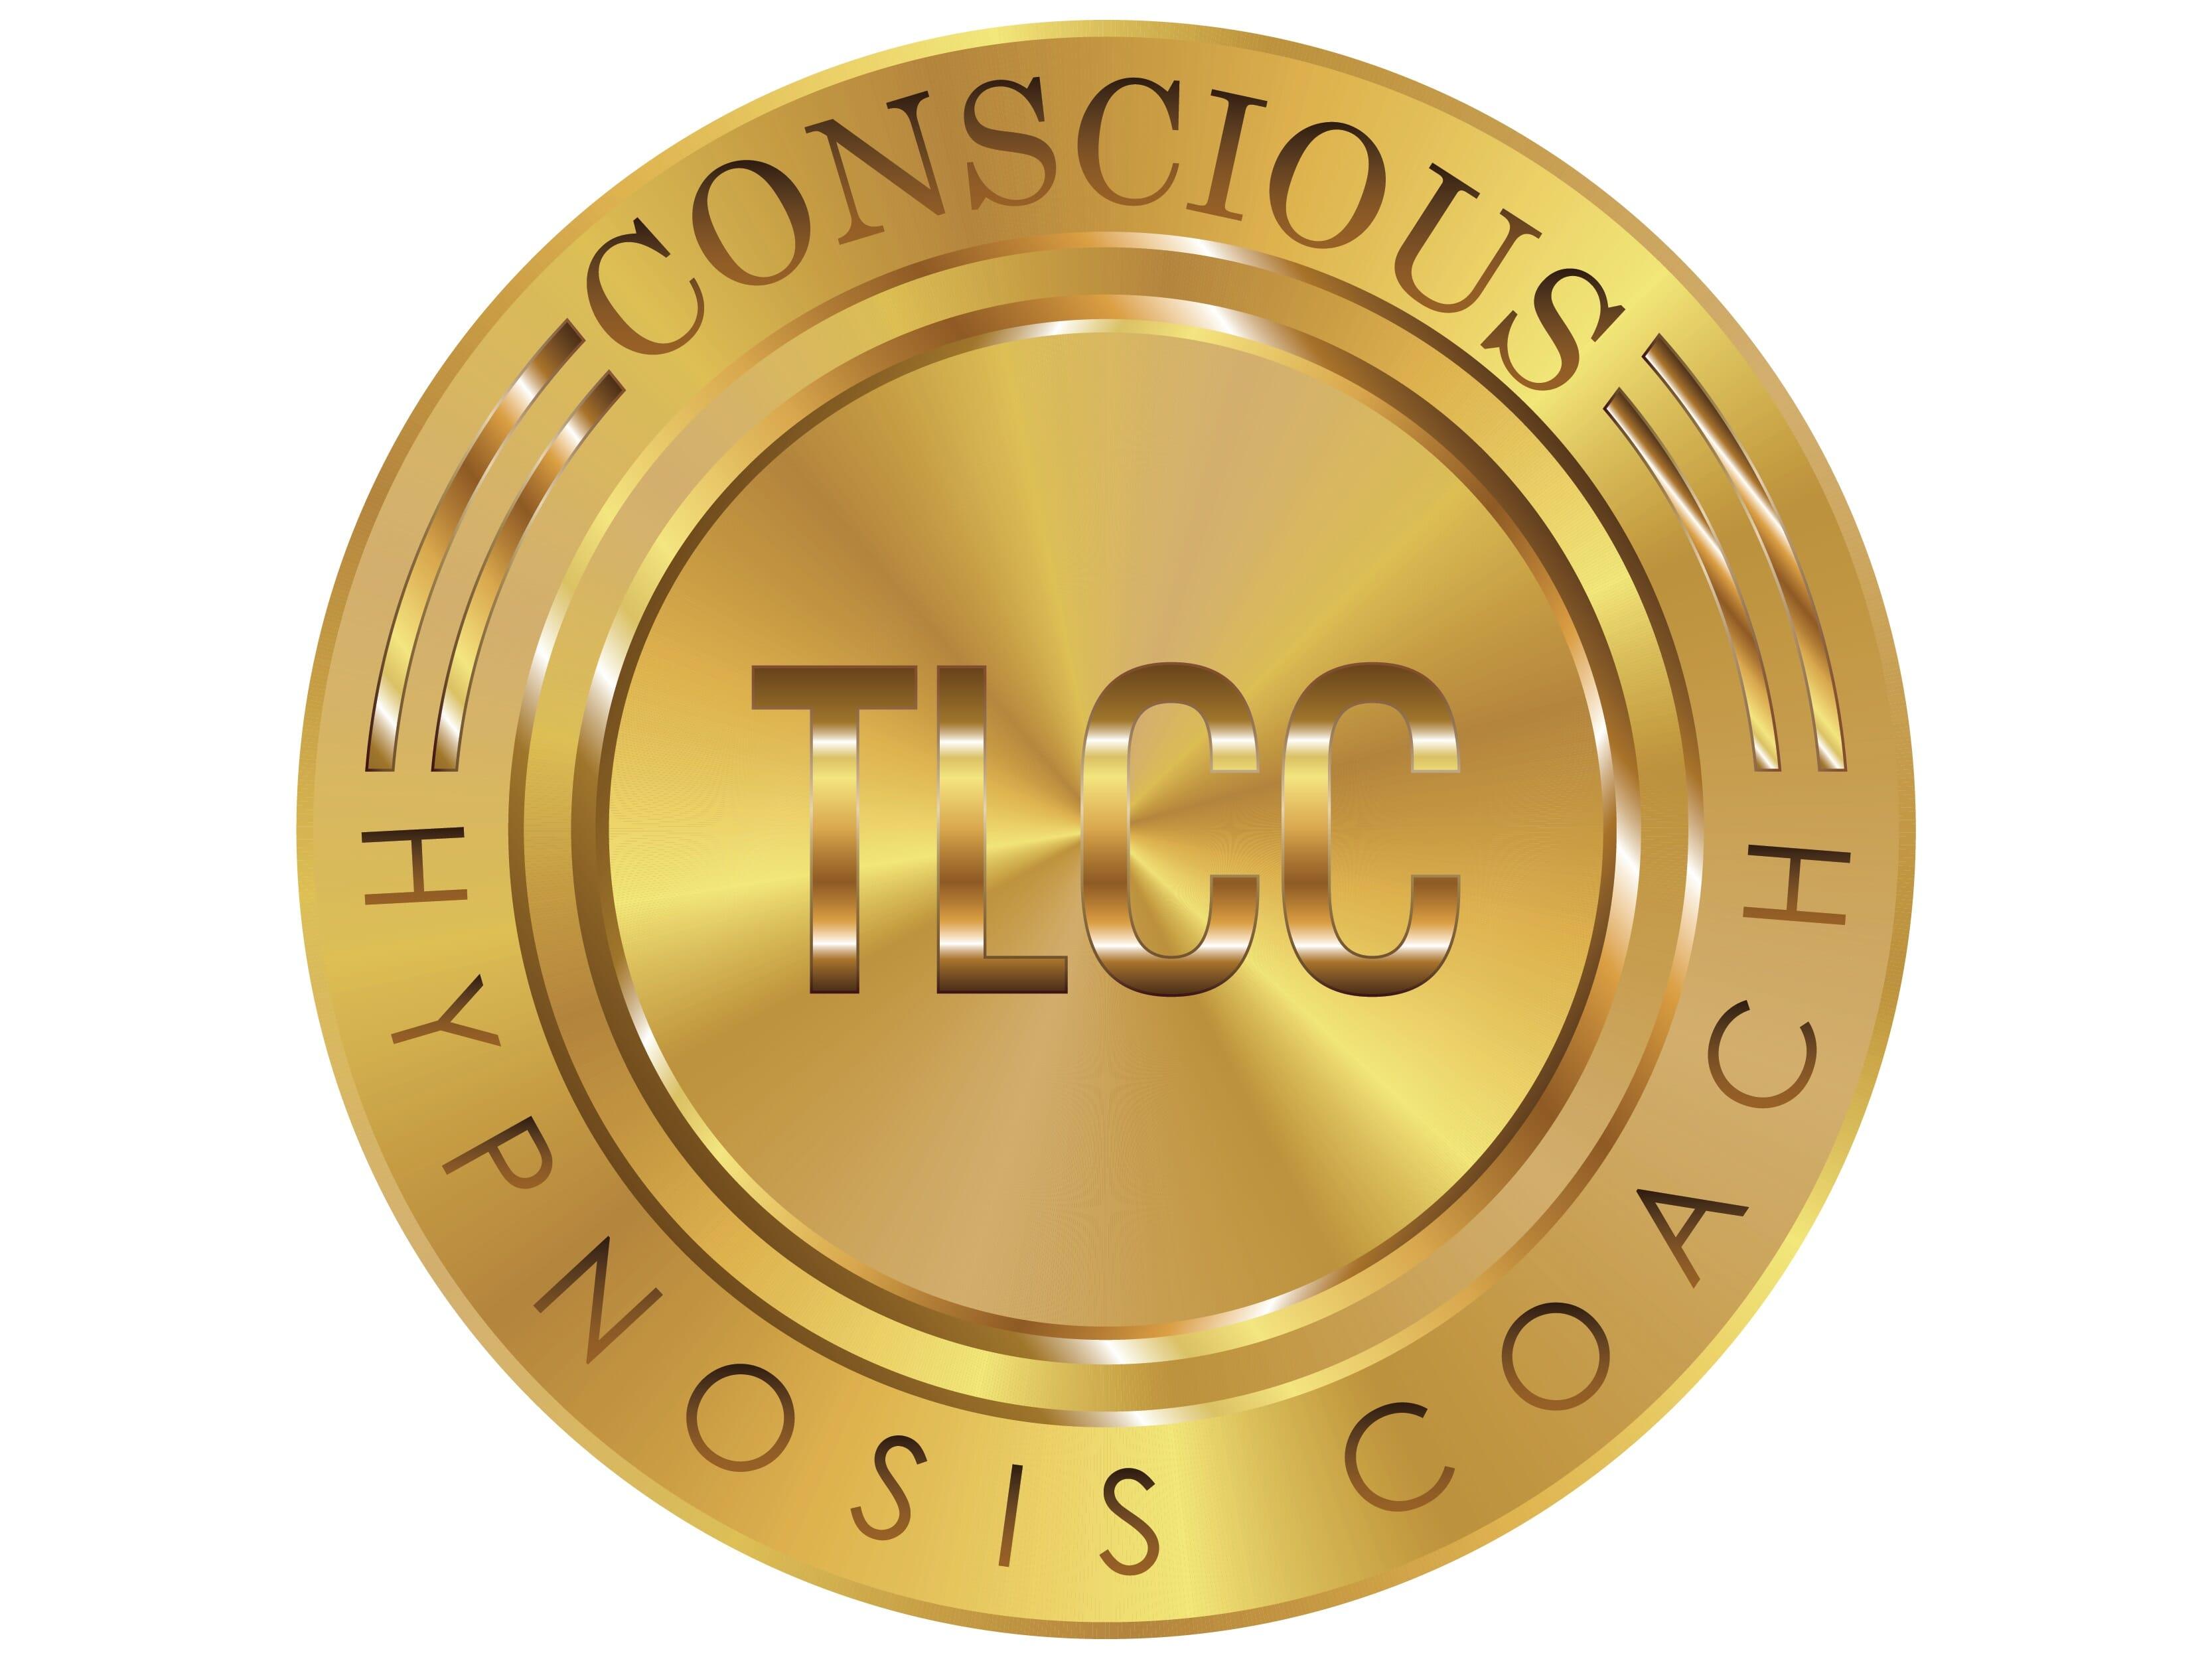 Conscious%20Hypnosis.jpg